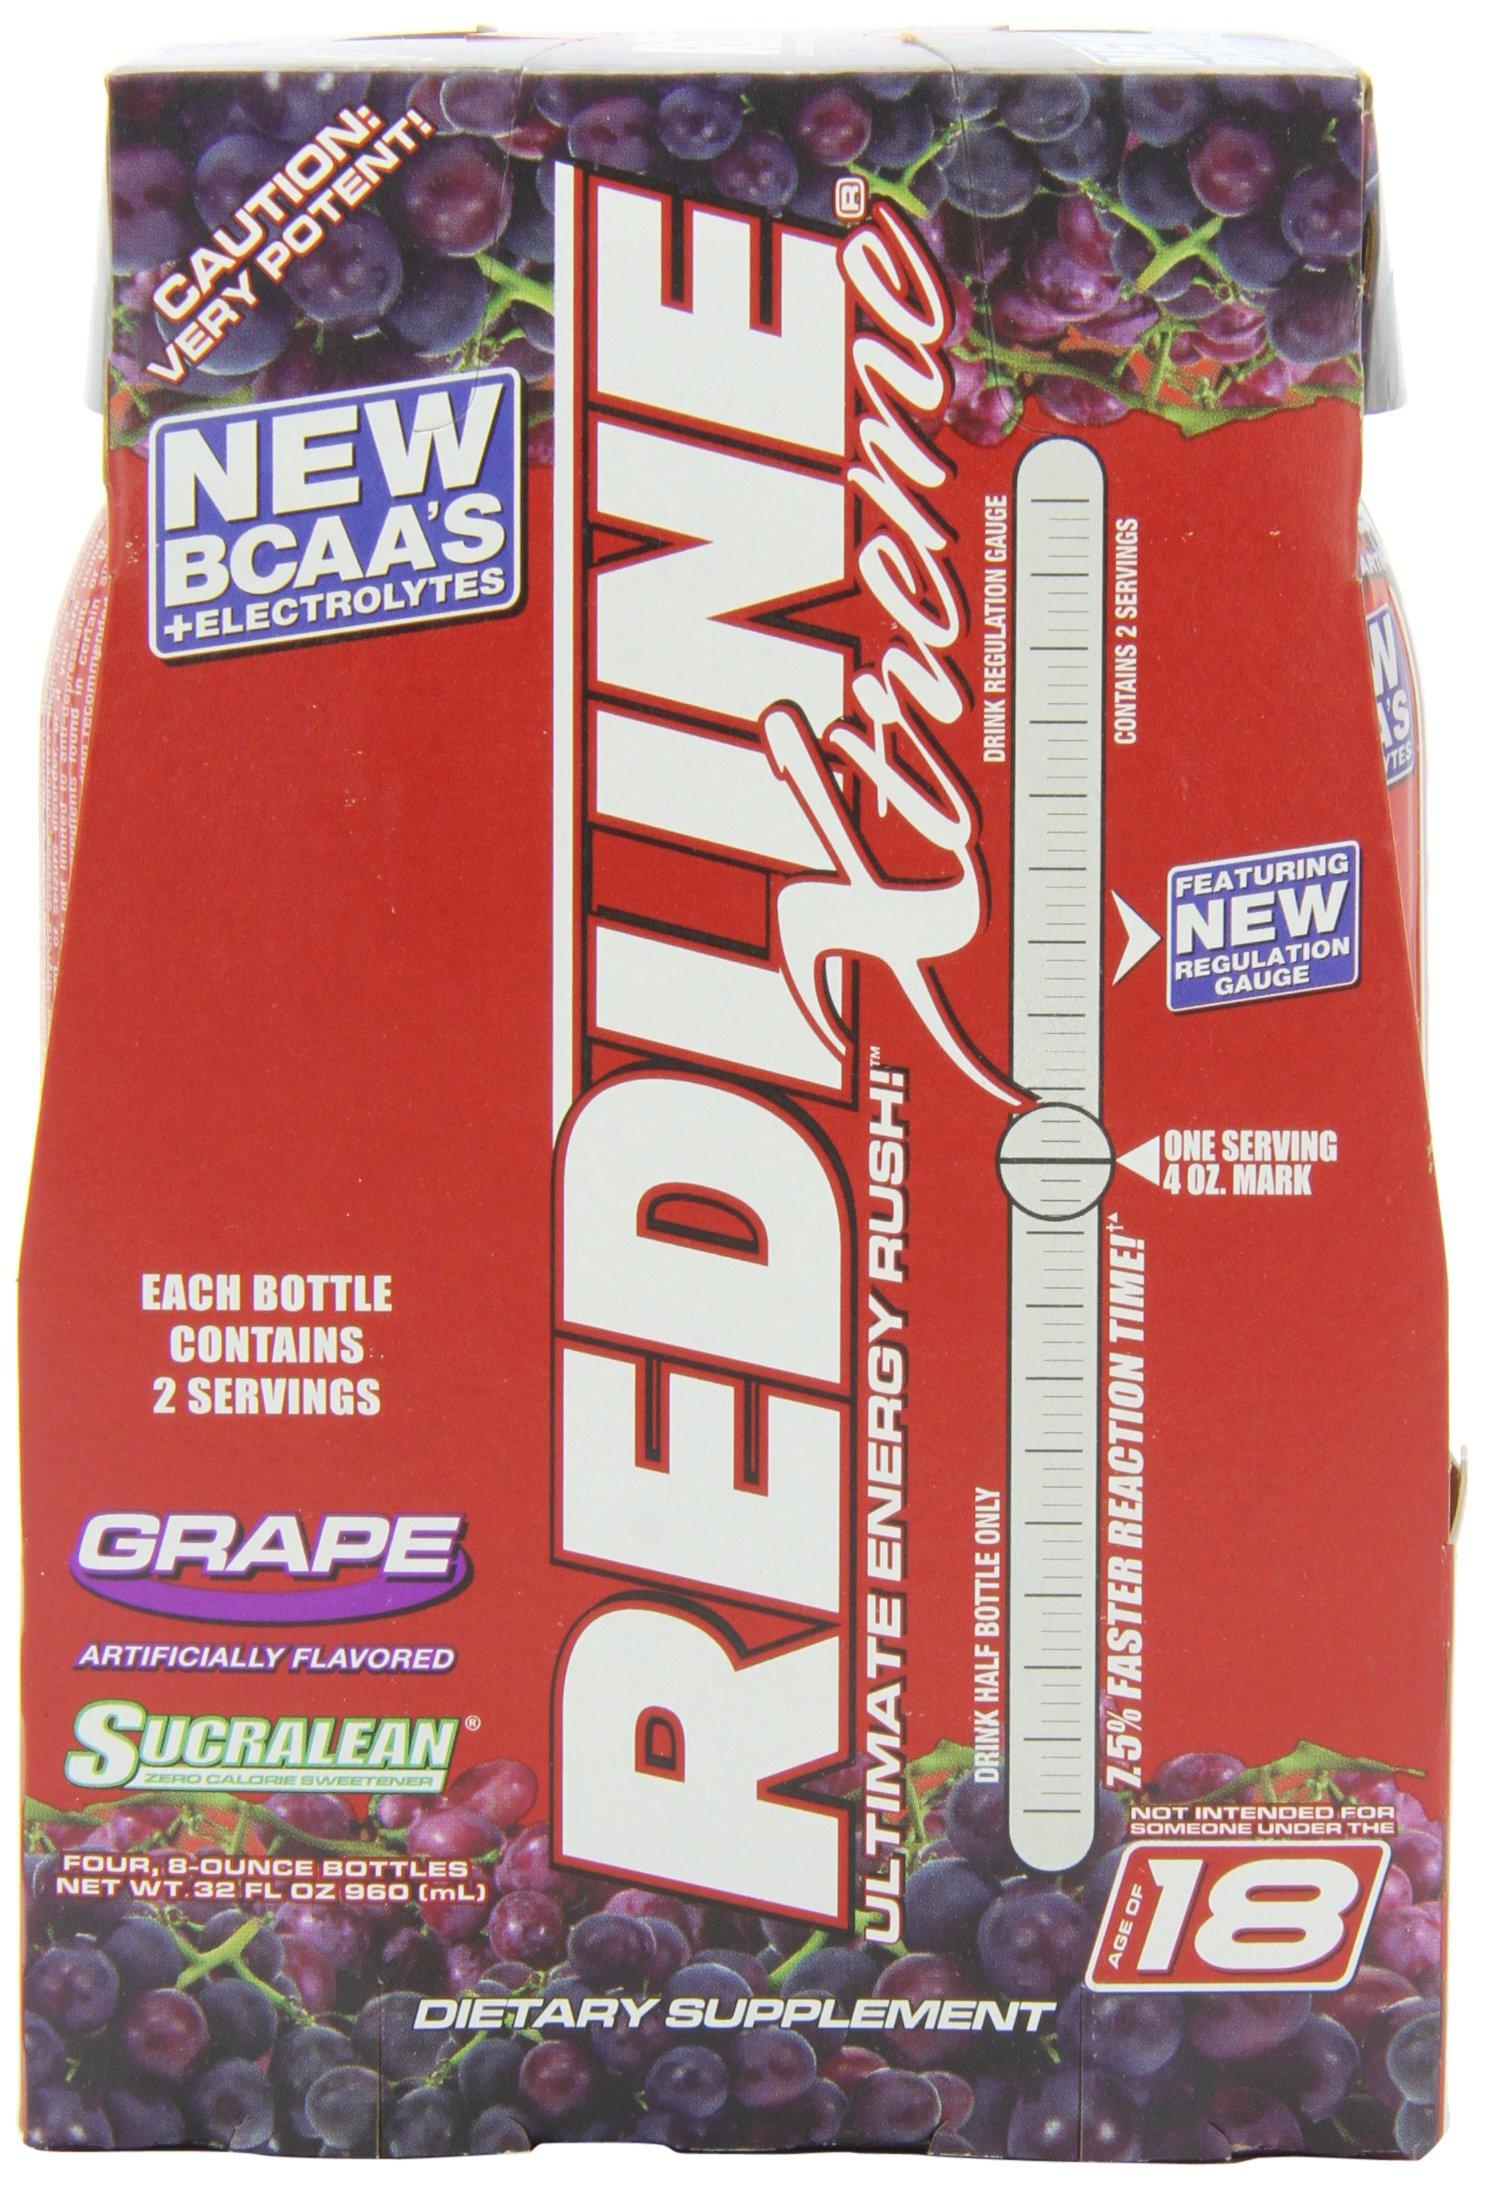 VPX Redline Extreme Grape 8oz, 24-Count